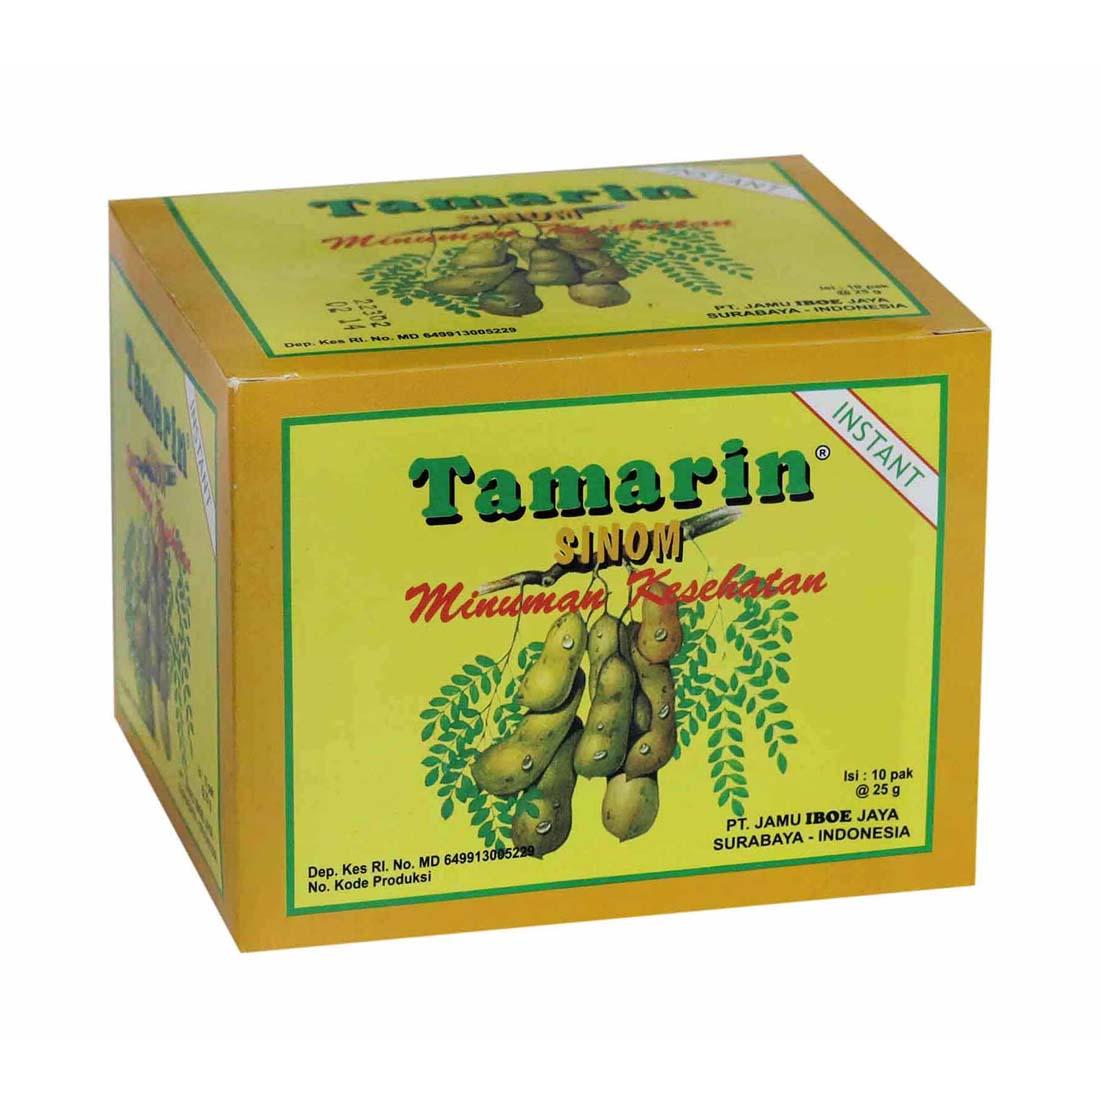 JAMU IBOE TAMARIN IBOE HEALTH DRINK 25 G